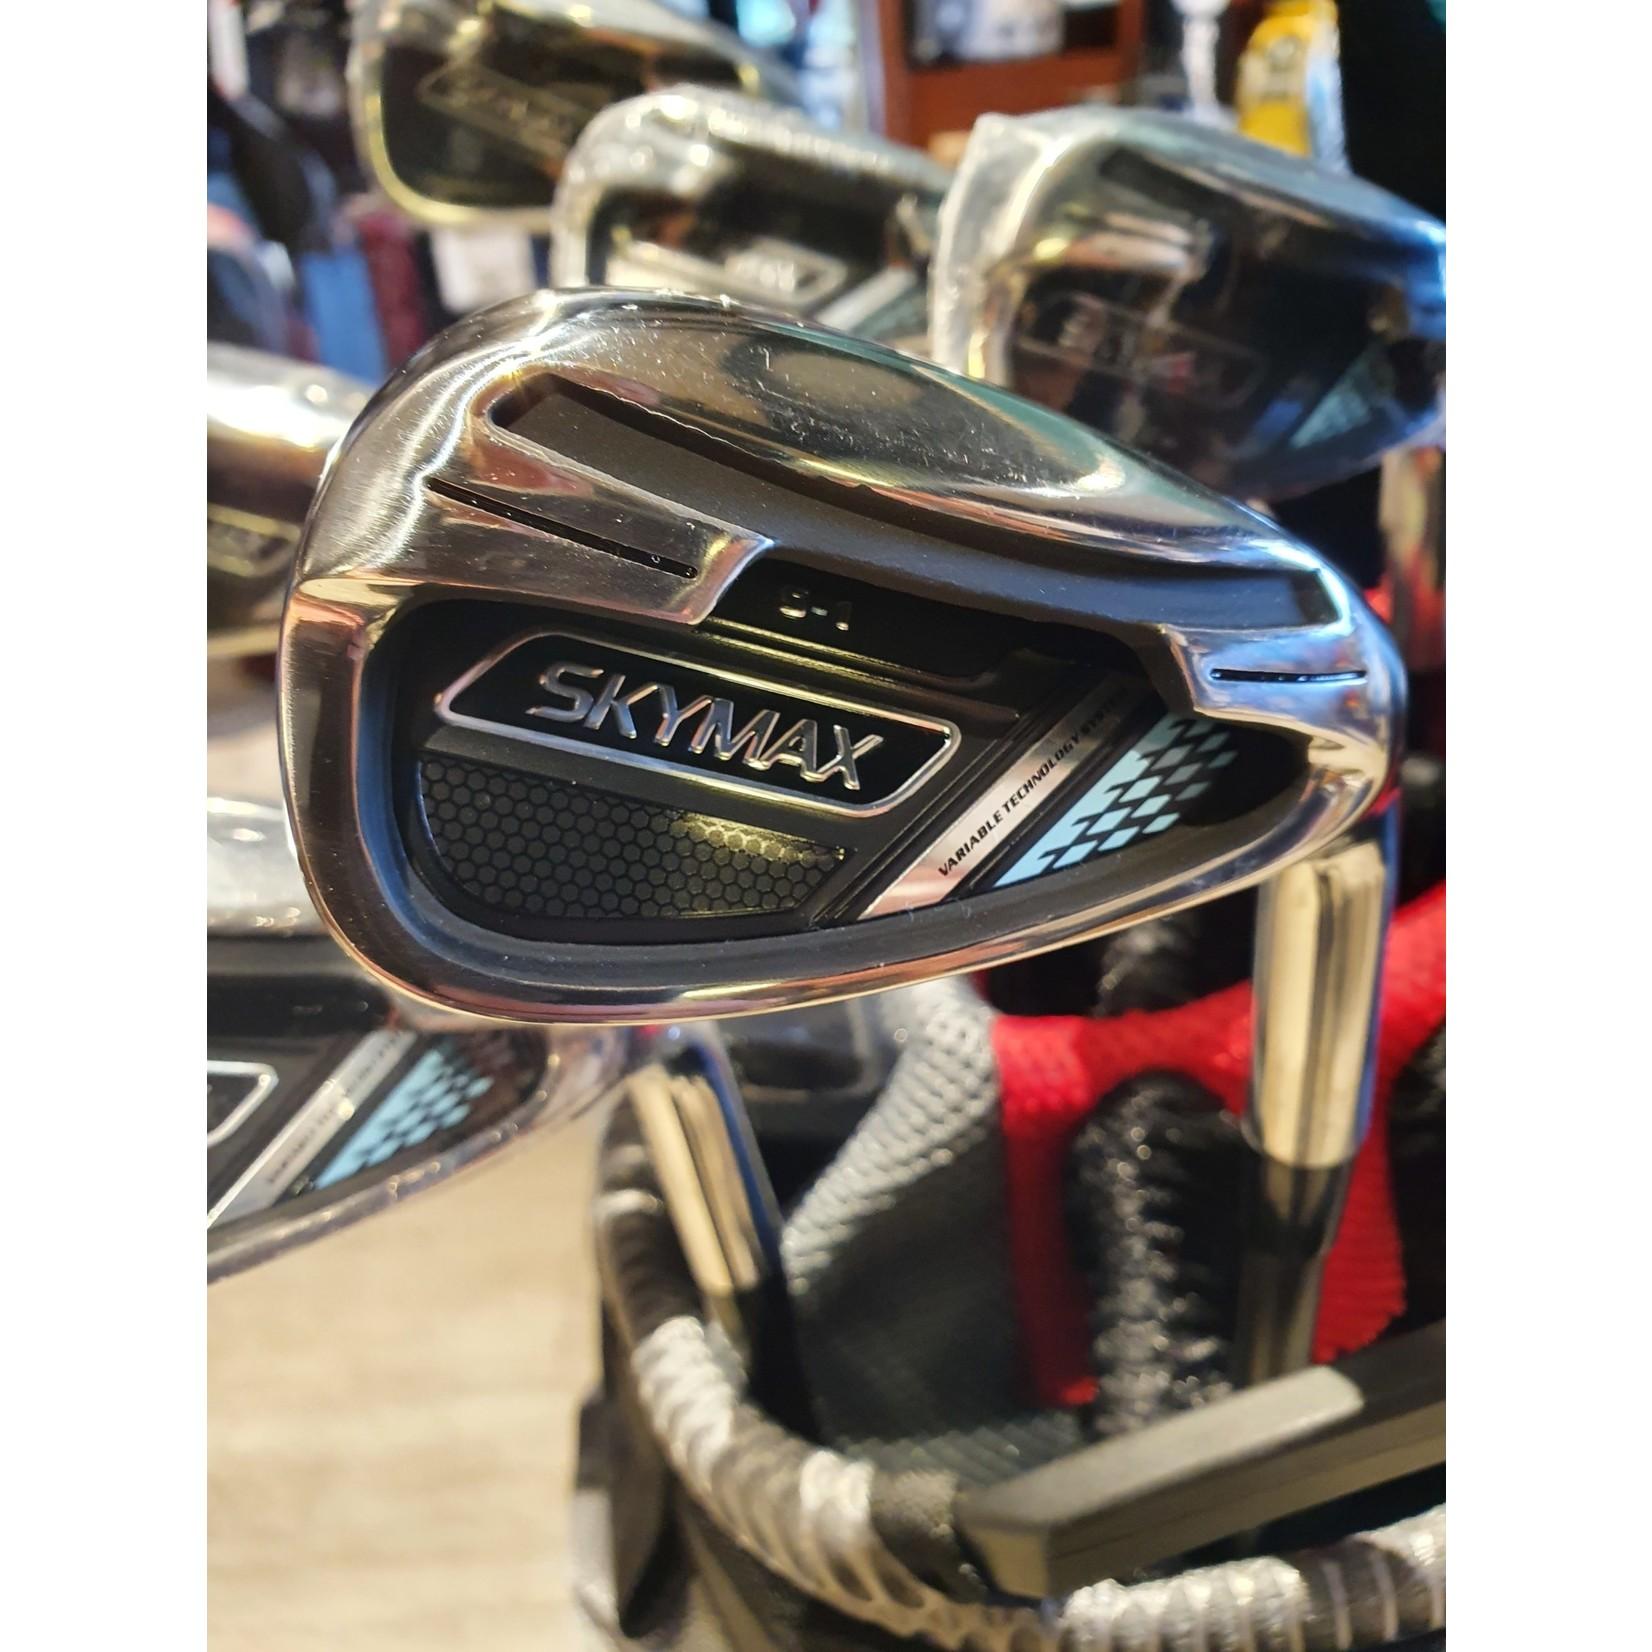 "Skymax Skymax S1 dames +1"" complete set - met golftas"